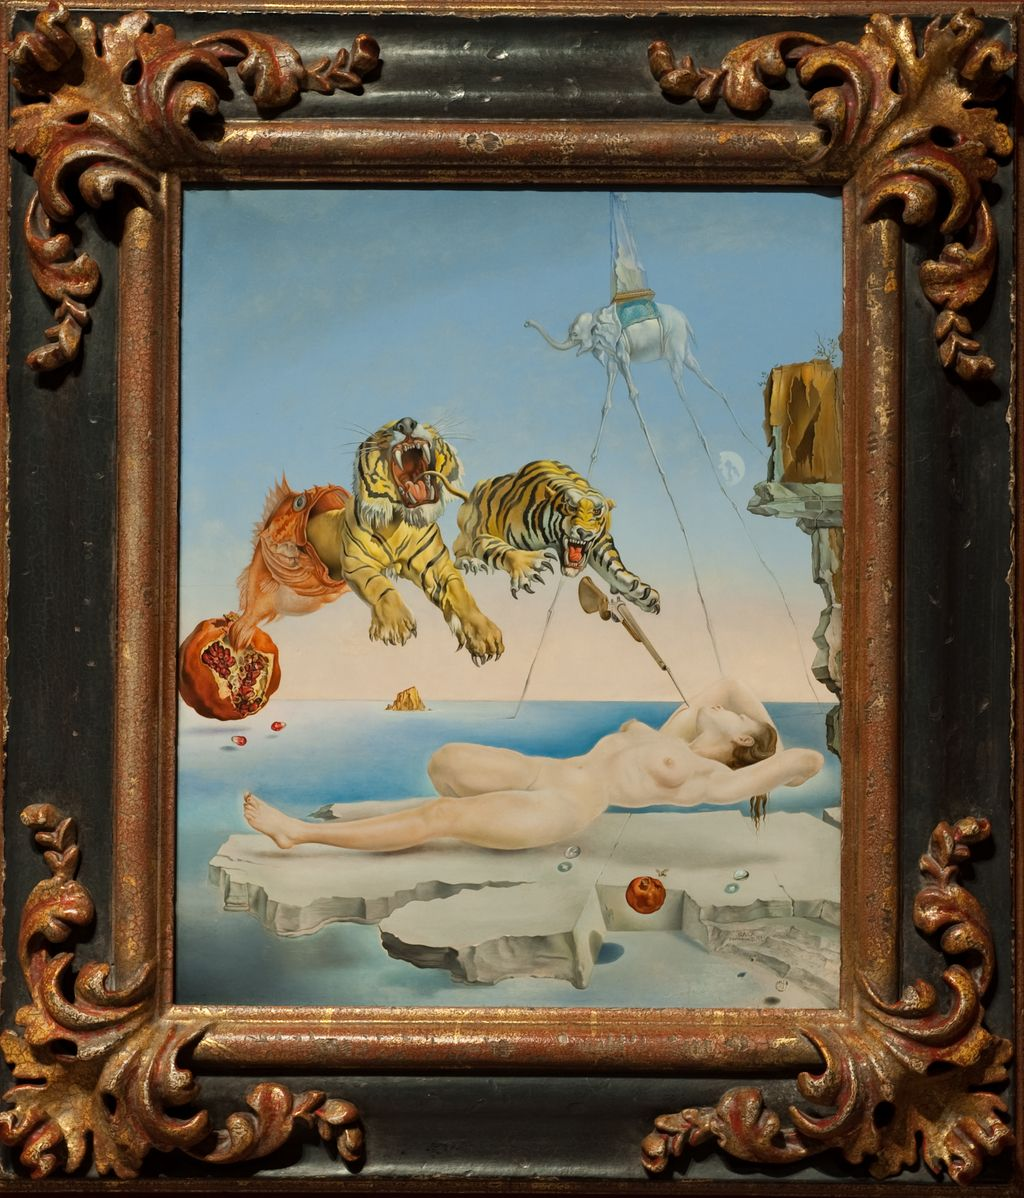 Cuadro de Dalí, 'Lágrimas de Eros'